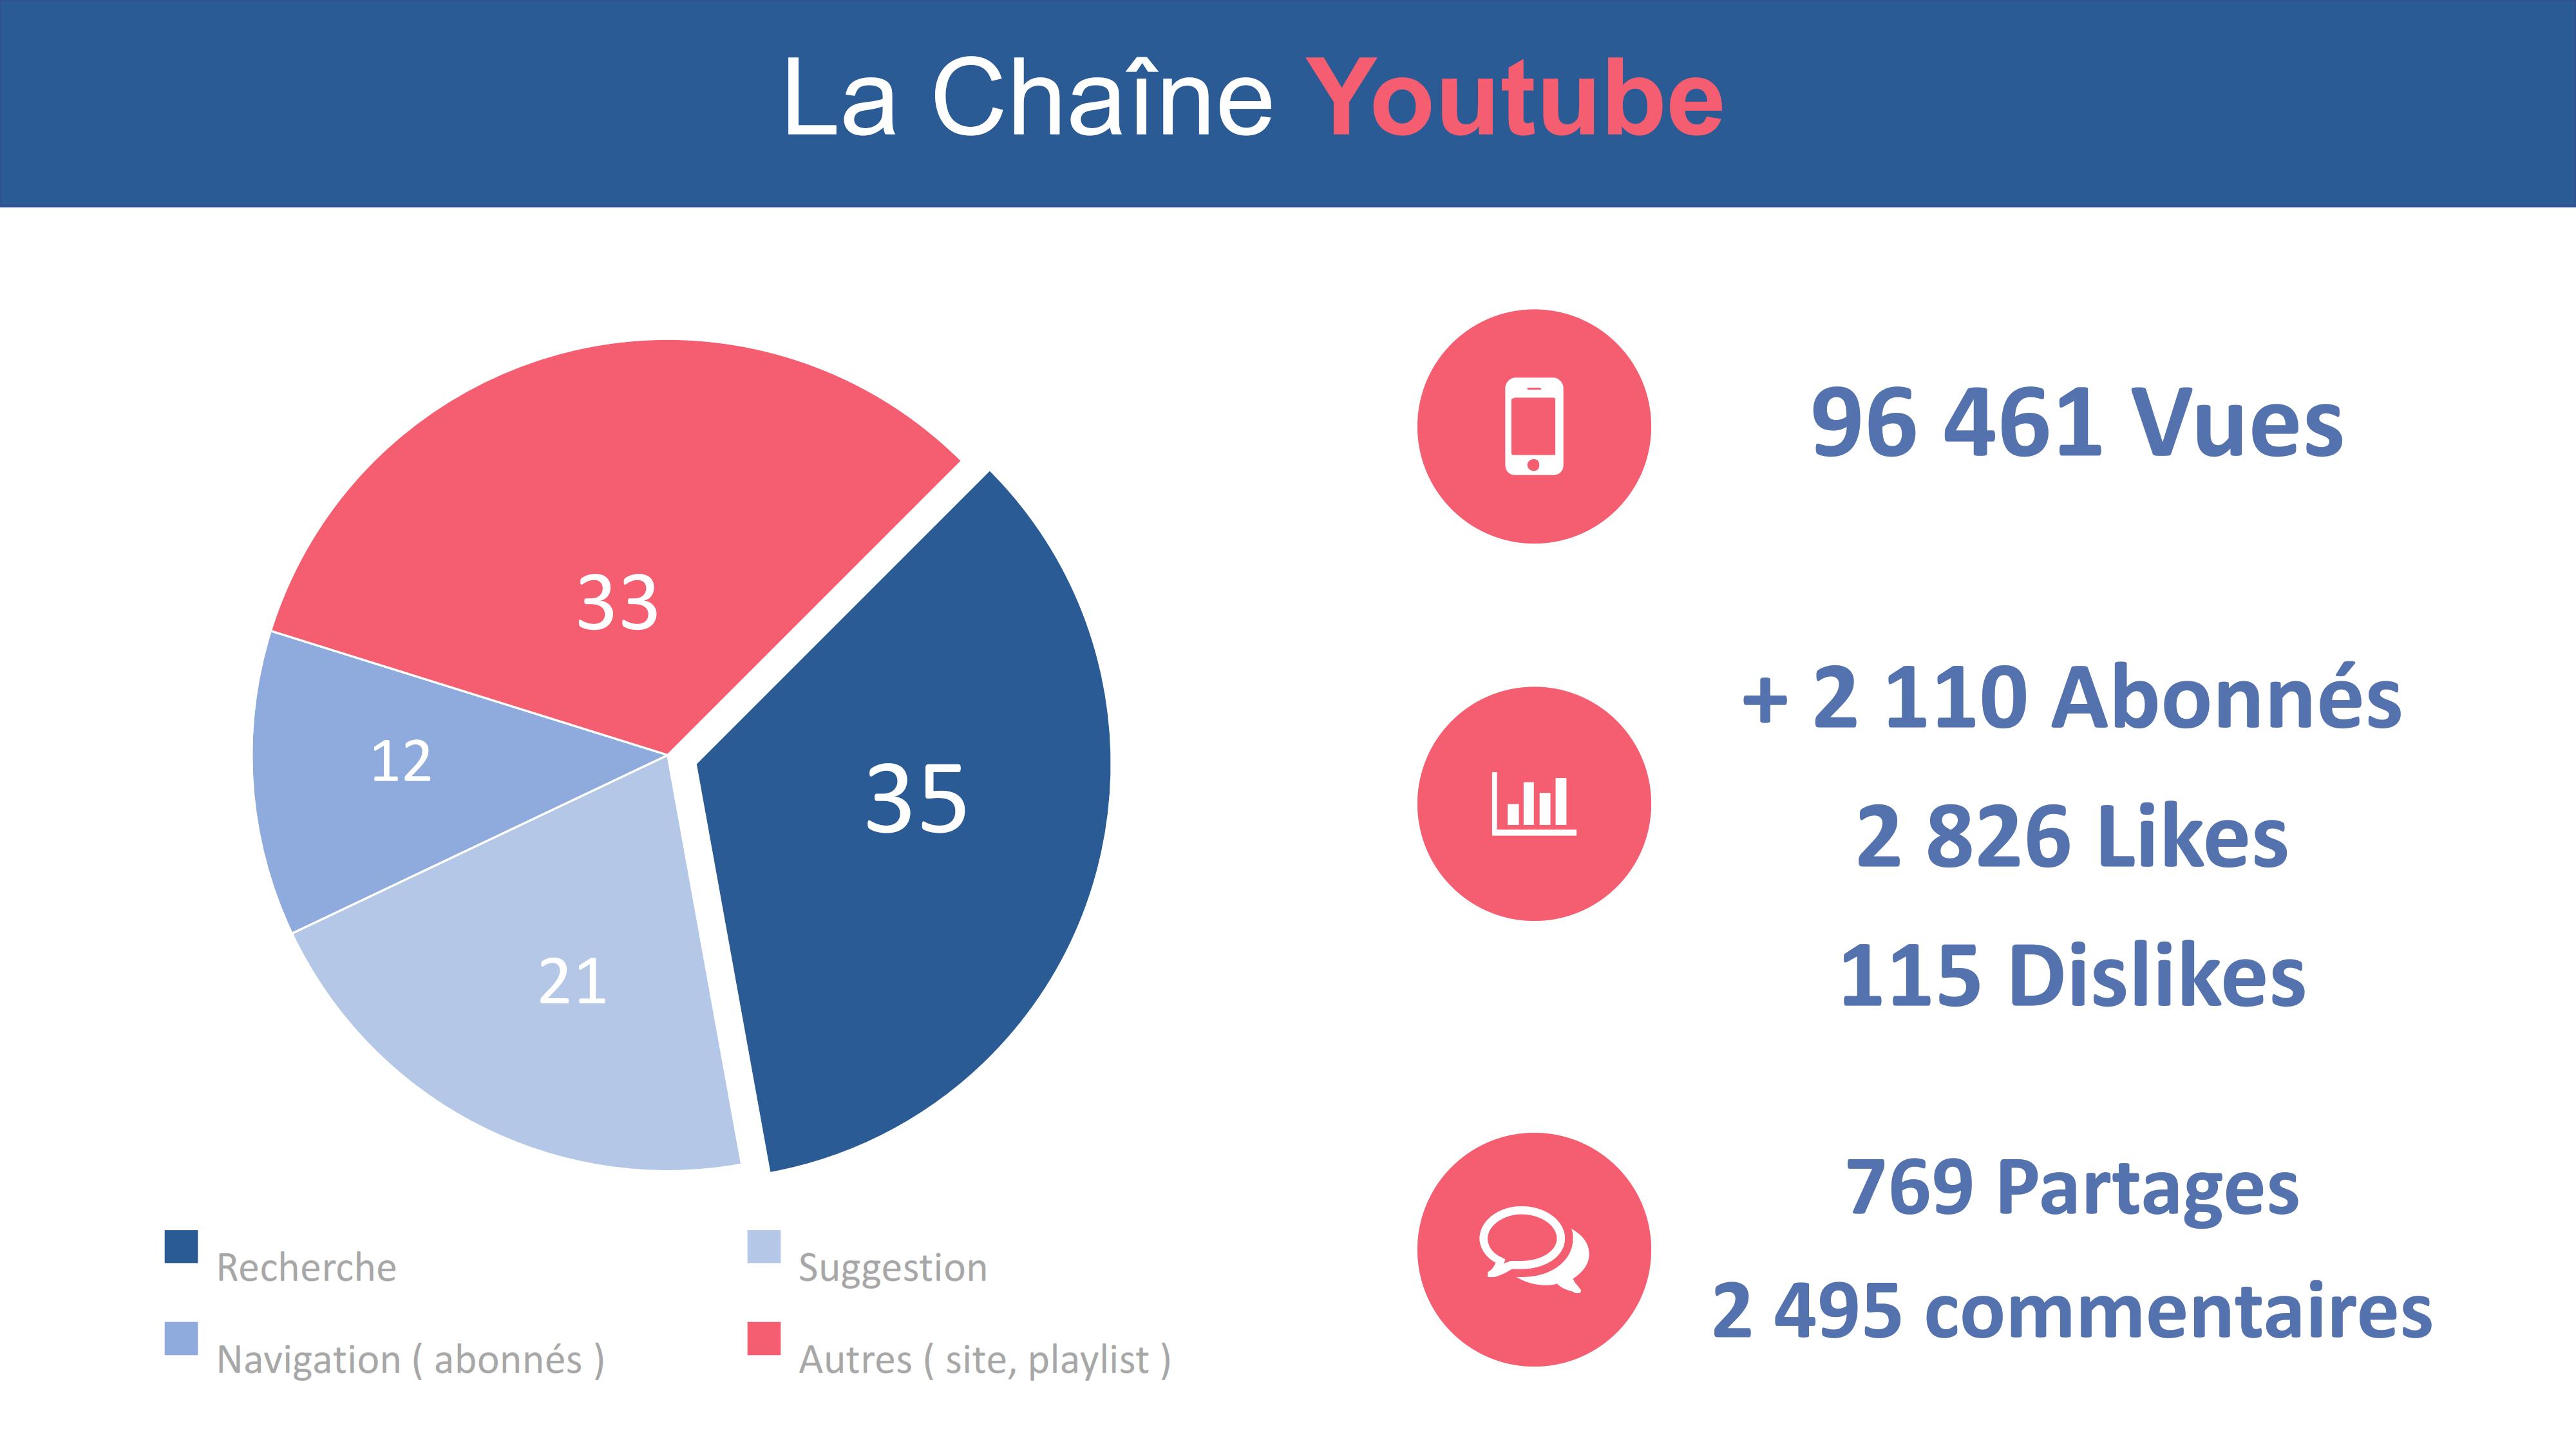 Les statistiques de ma chaîne Youtube